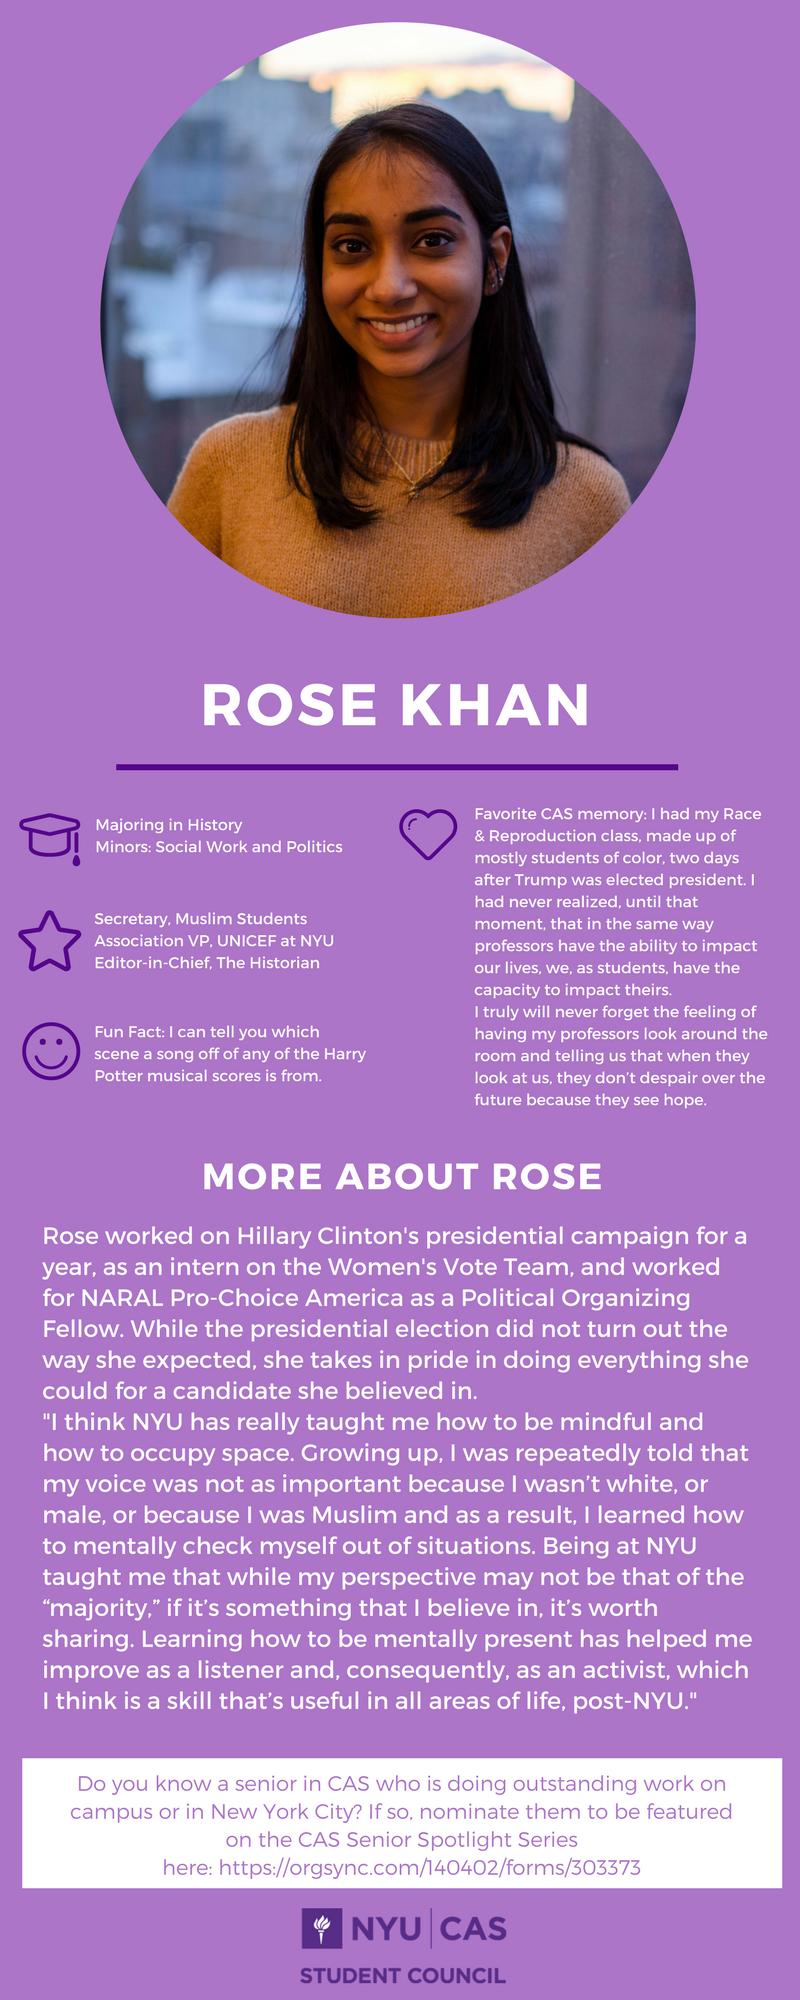 Rose Khan